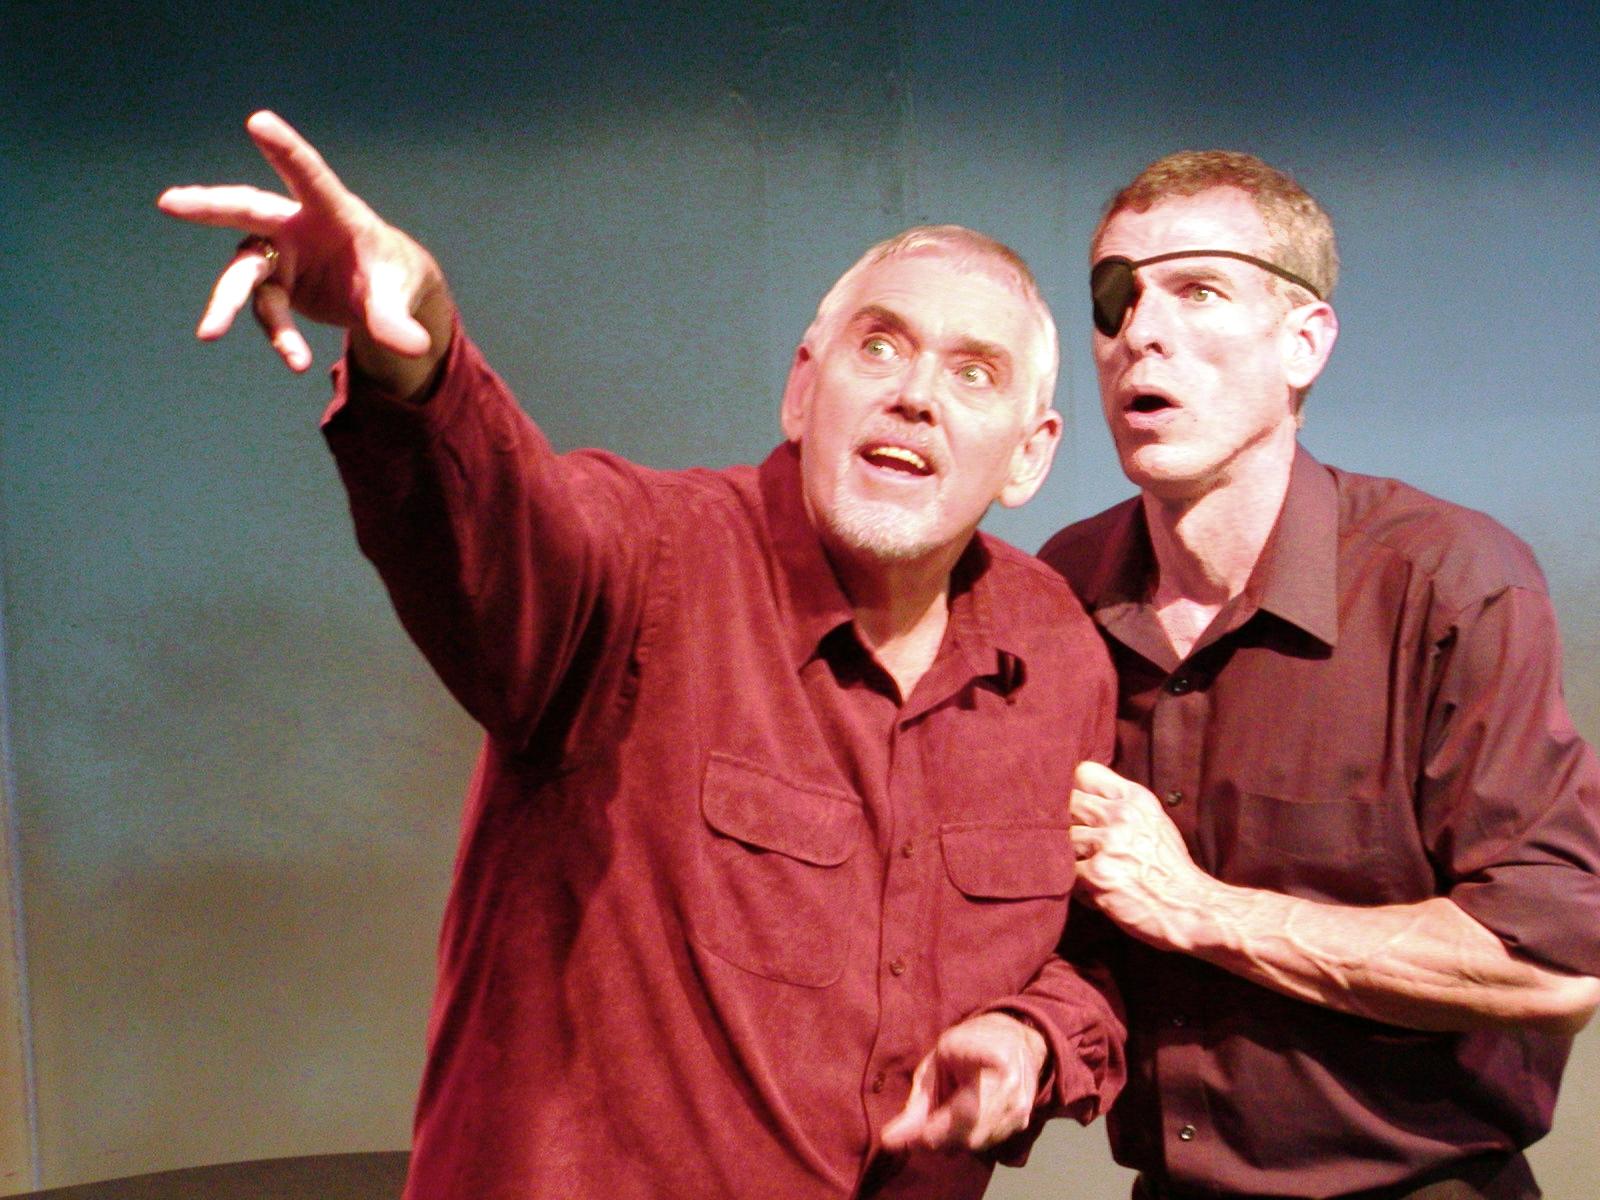 Actors Jim Brochu and Steve Schalchlin performing in The Big Voice: God or Merman play.